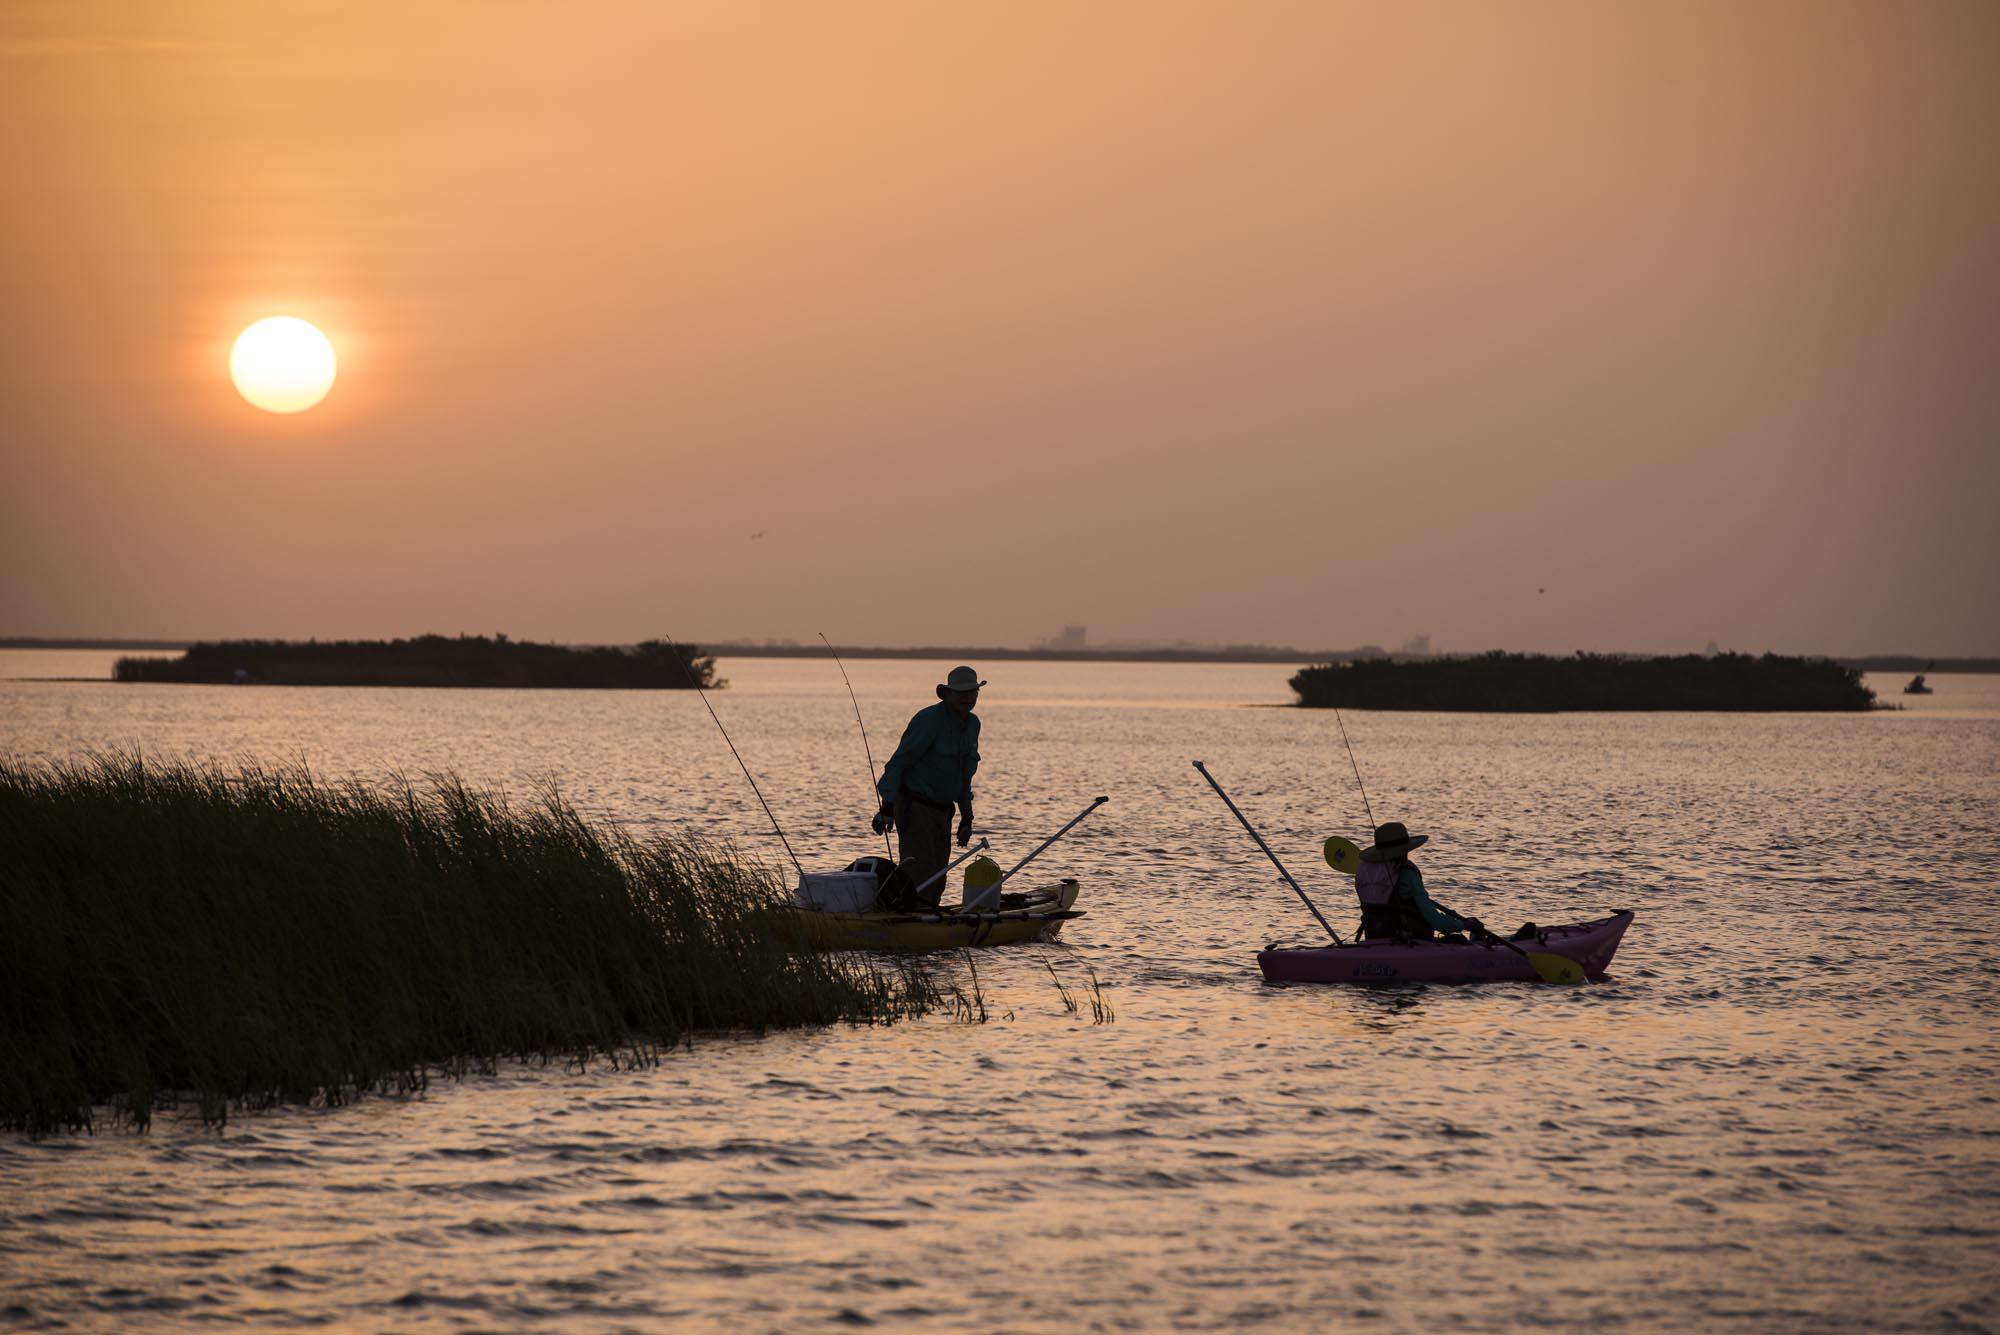 Anglers fishing on kayaks in Texas, near Port Aransas. Copyright Texas Parks and Wildlife